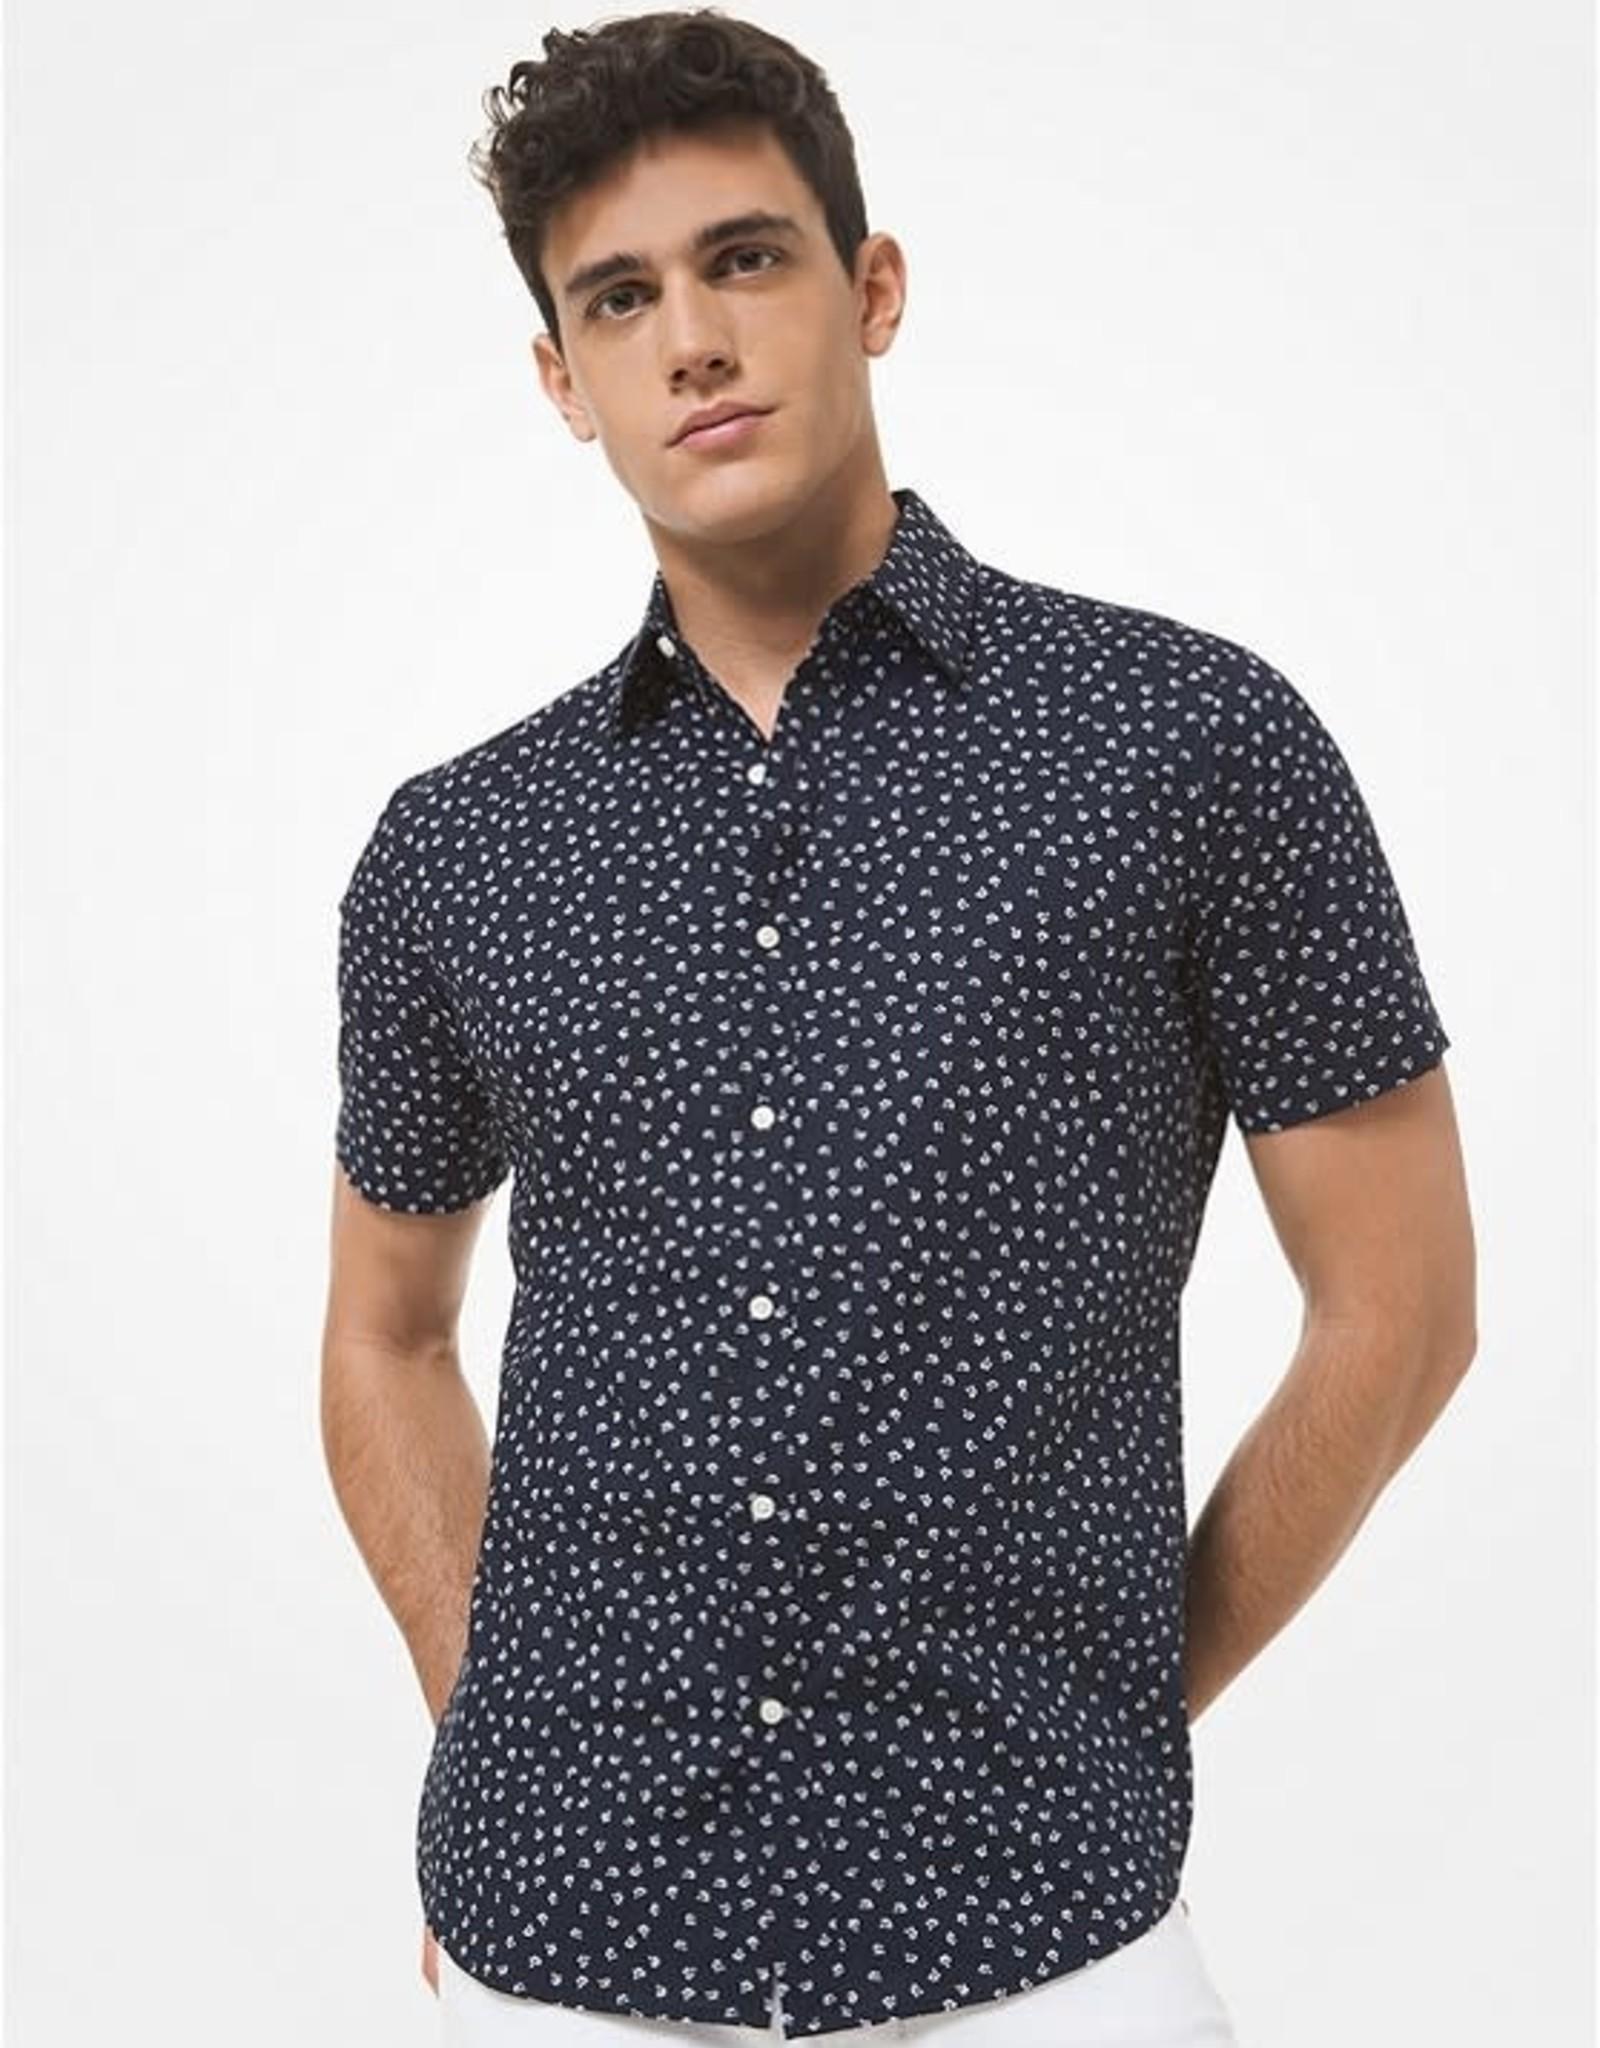 Michael Kors W Dot Shirt Michael Kors